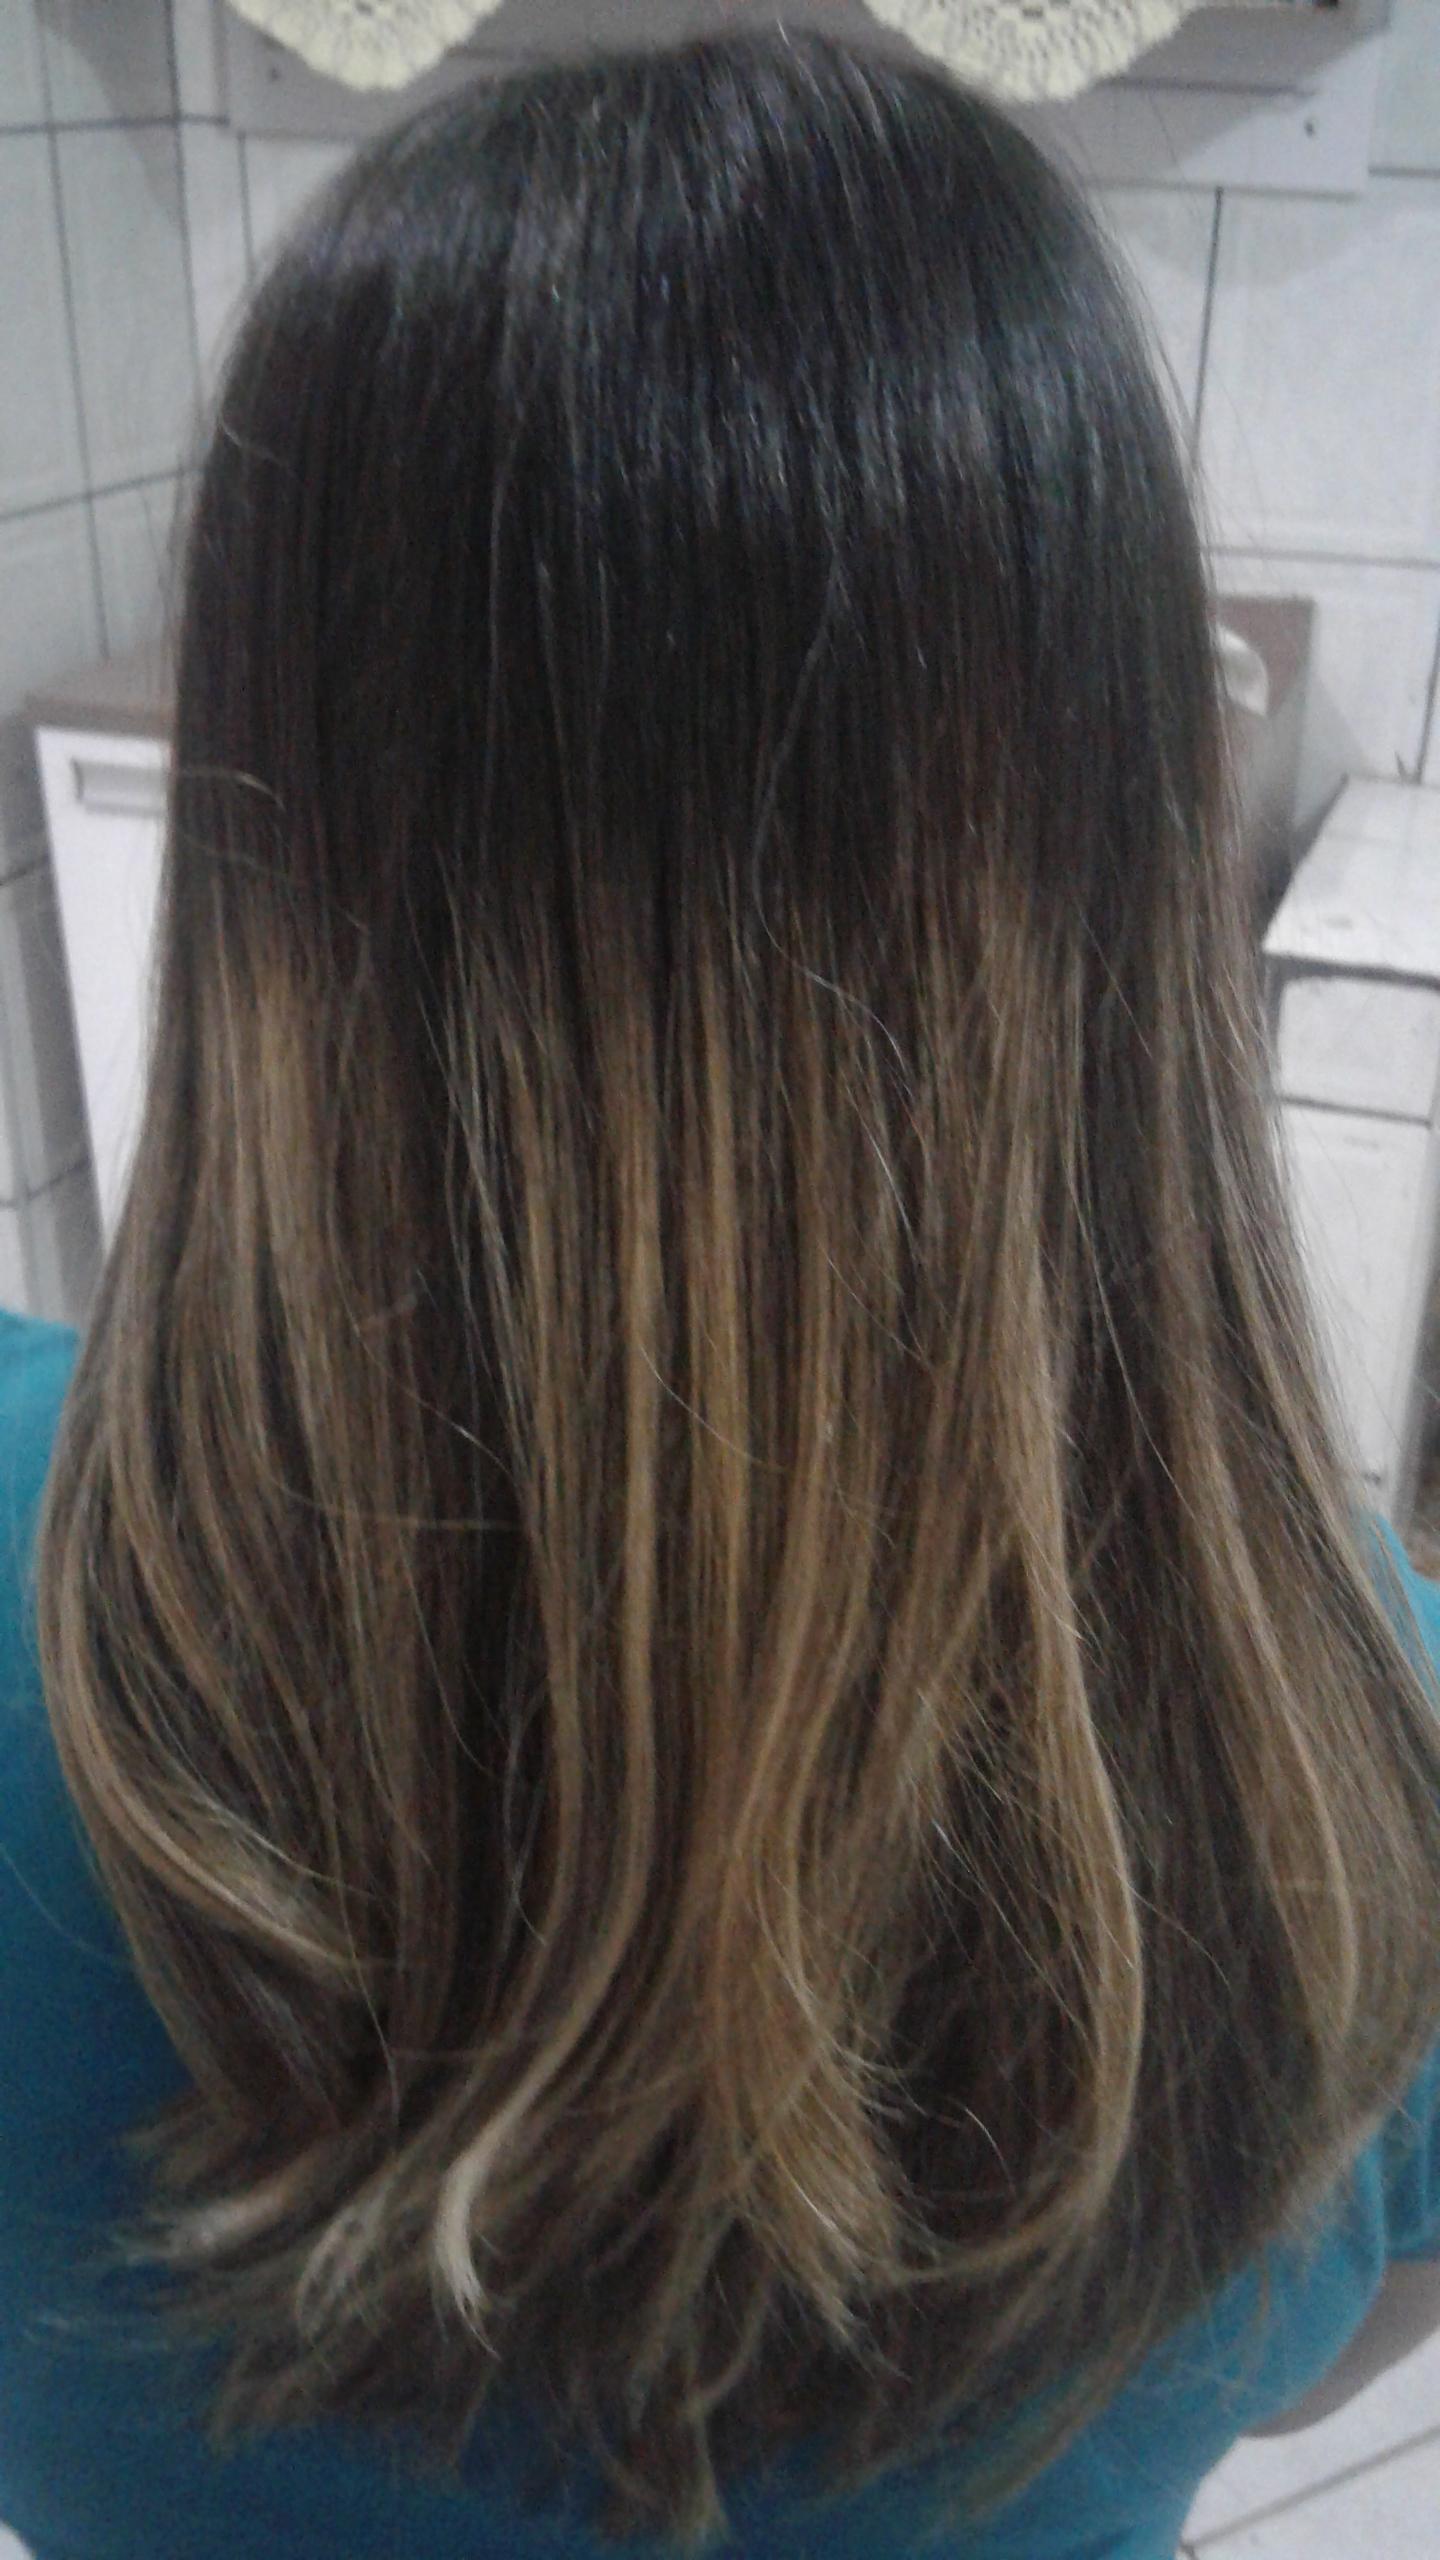 Mechas e escova cabelo auxiliar cabeleireiro(a)